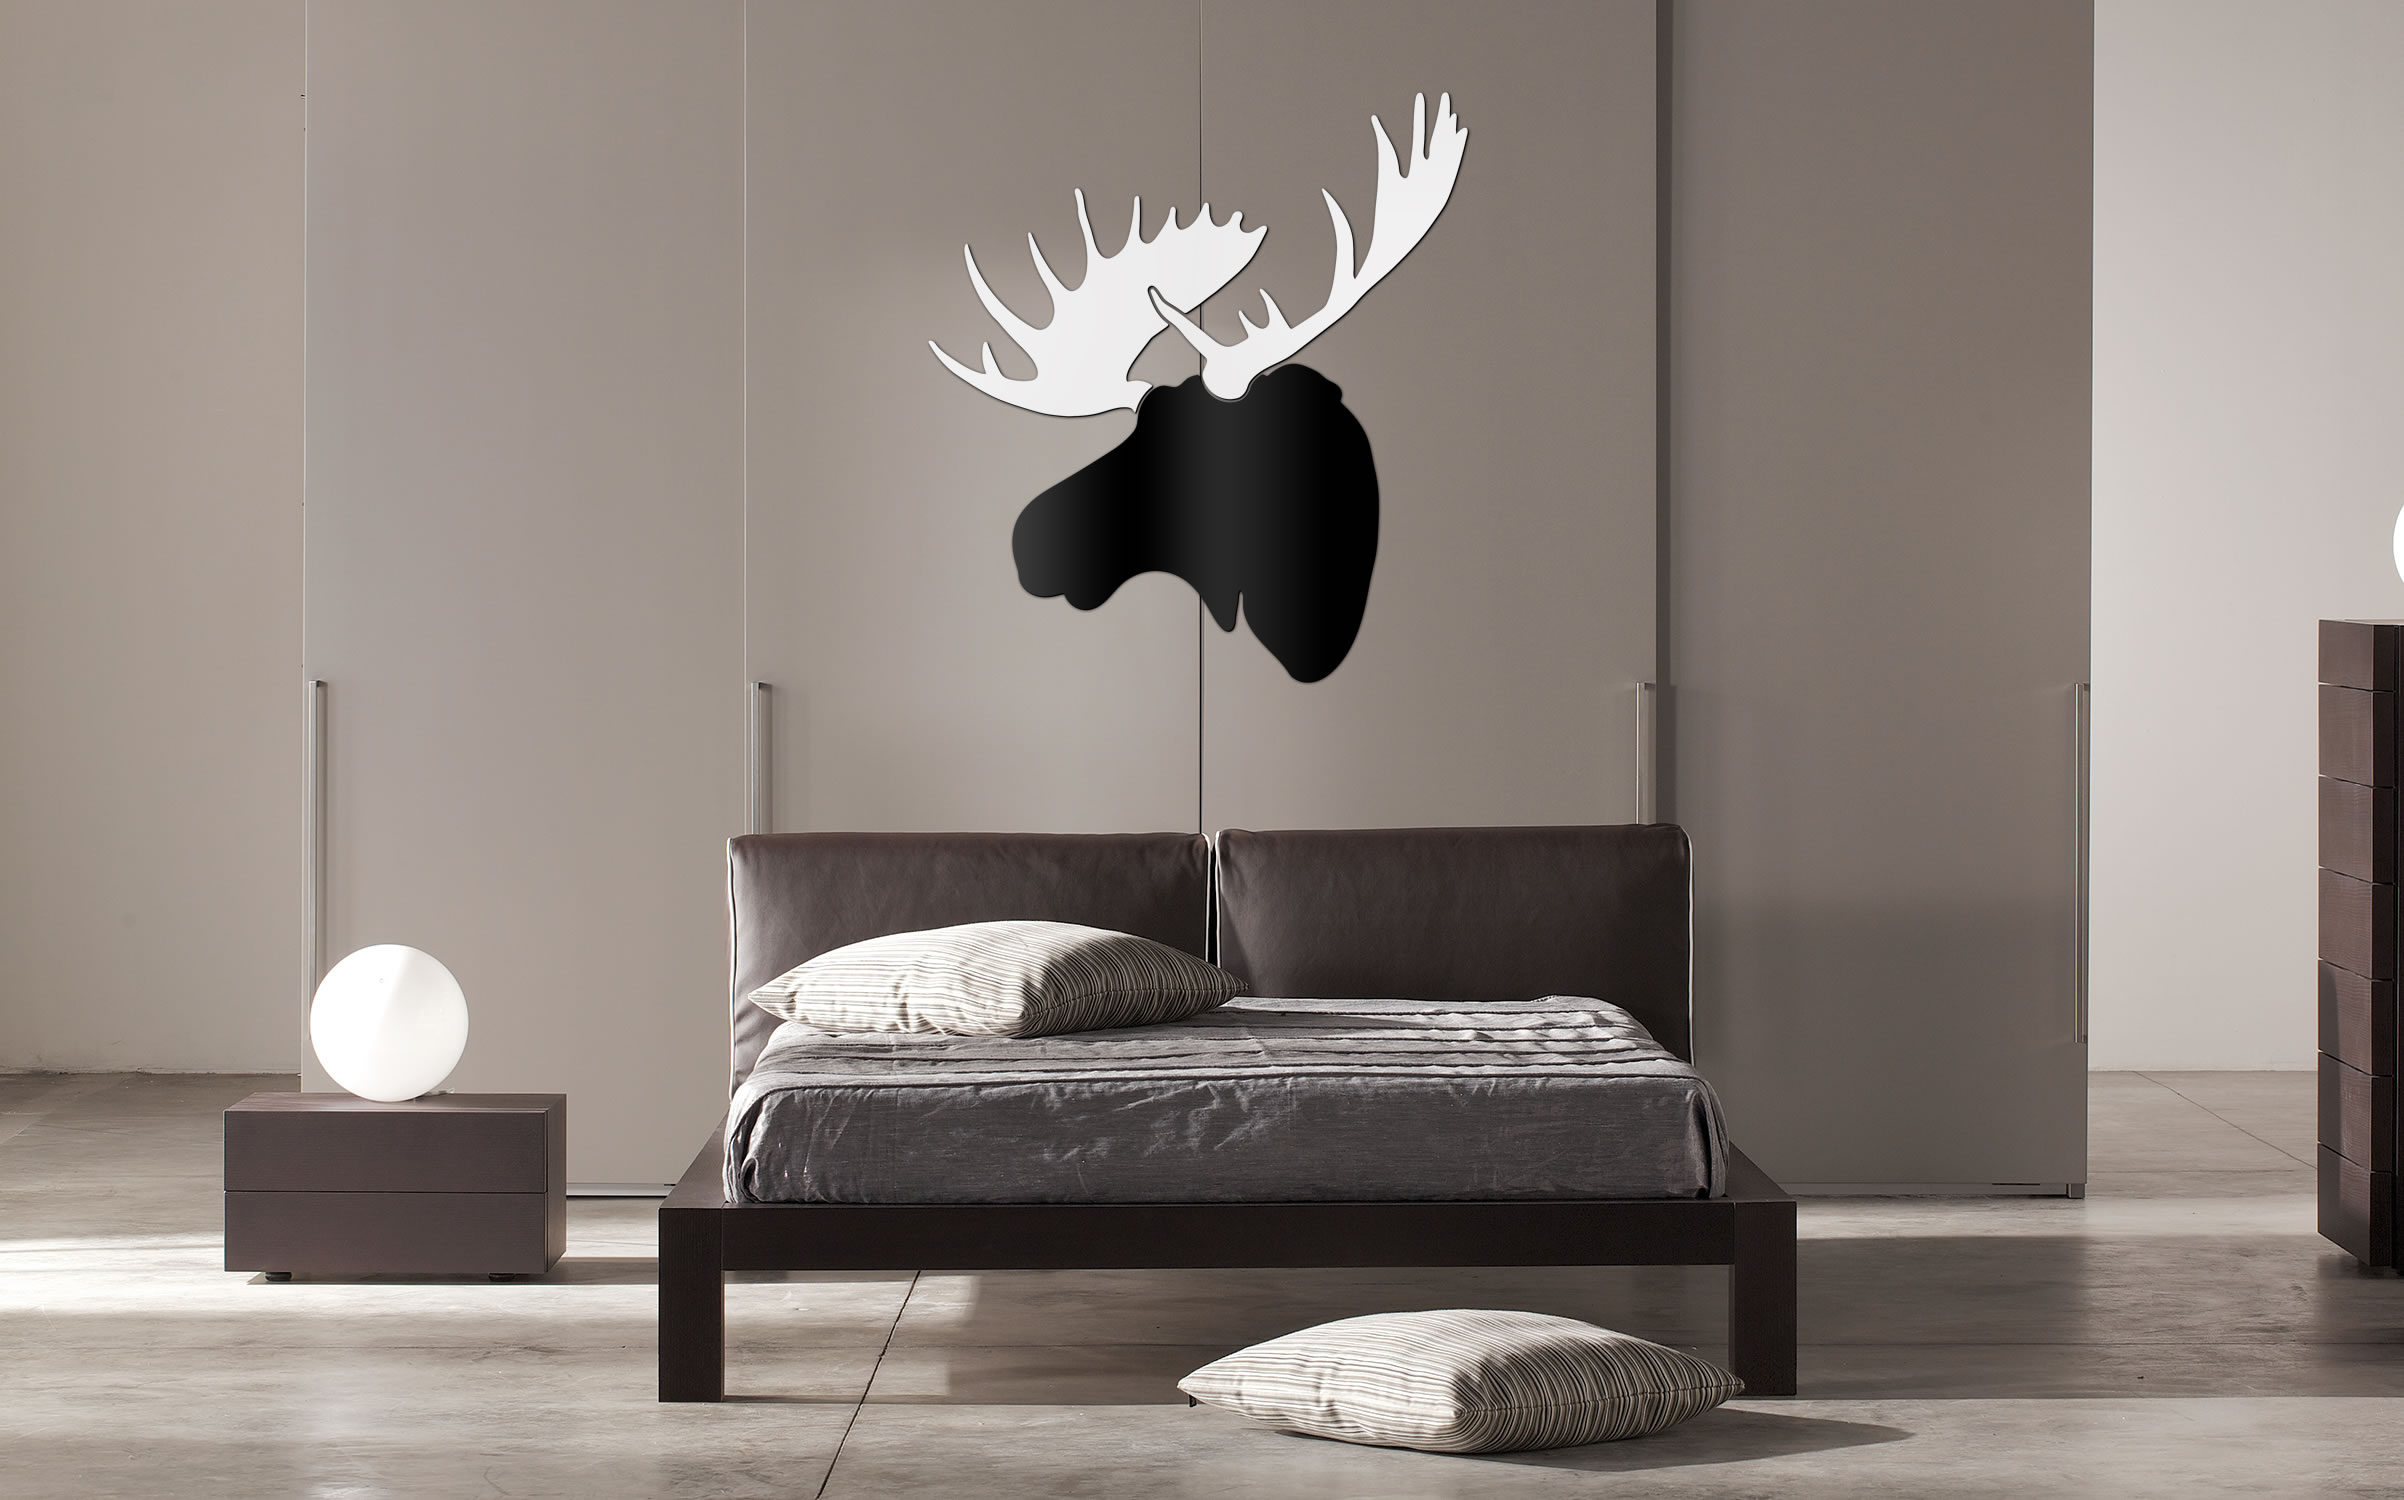 MODERN MOOSE - 36x36 in. Black & White D?cor - Lifestyle Image